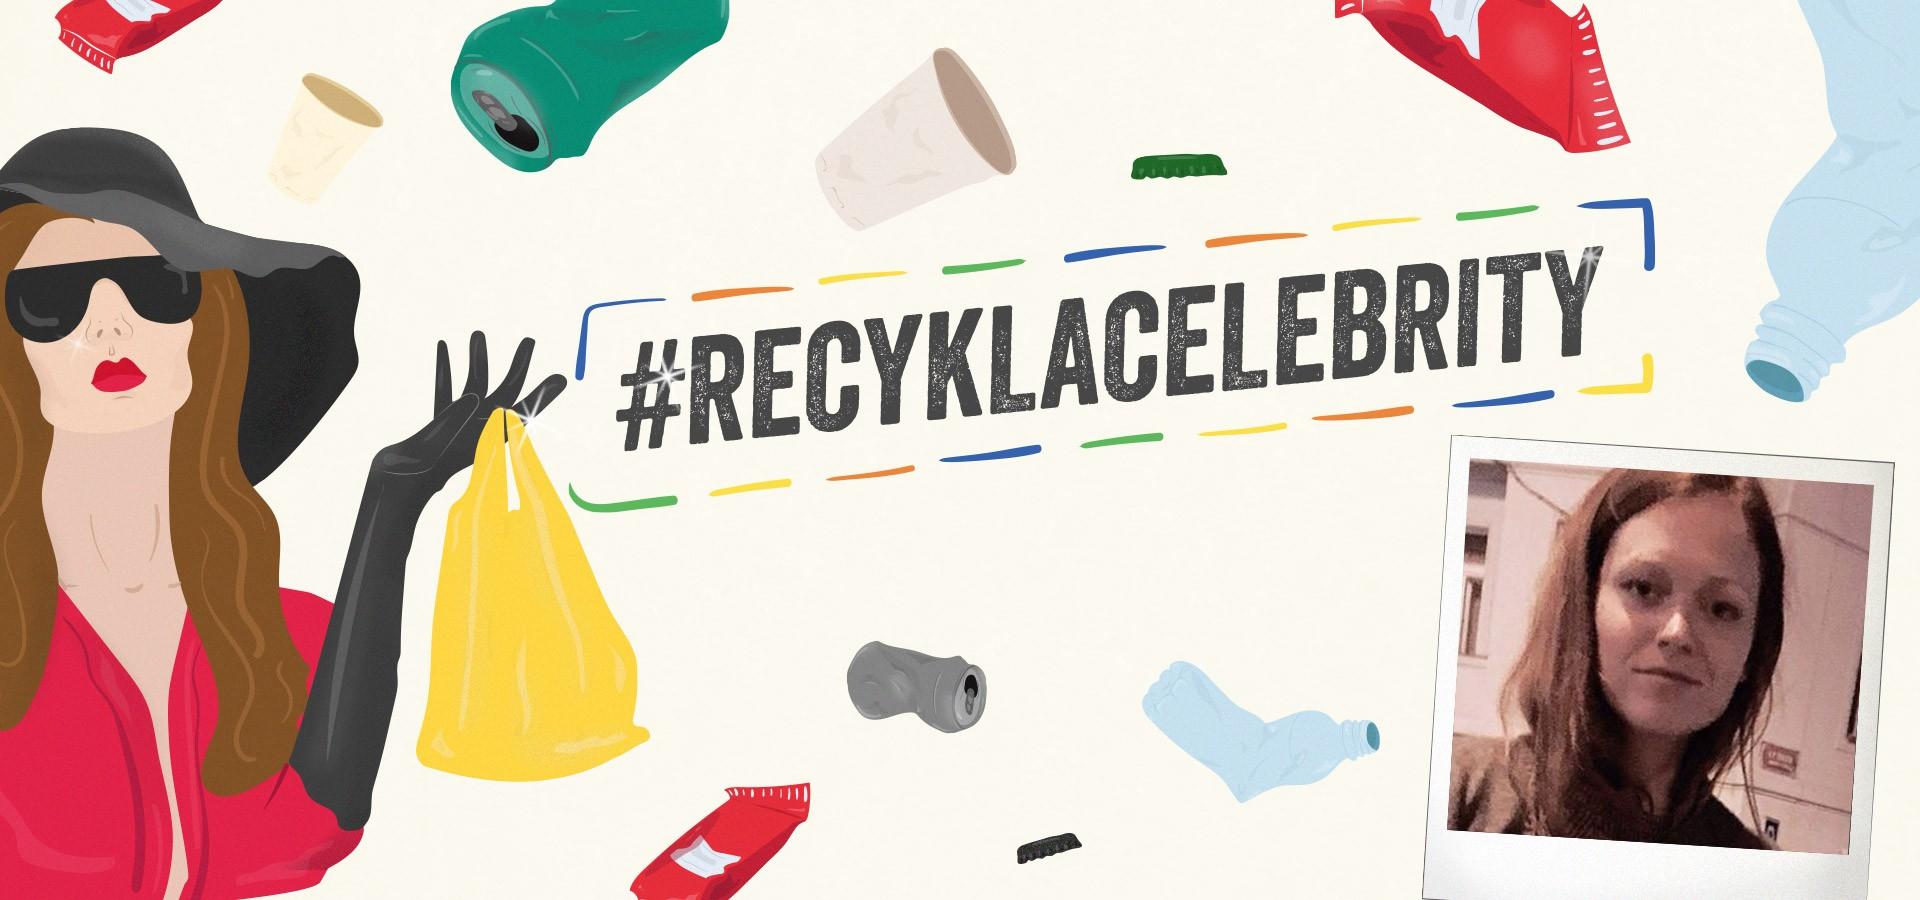 ester_geislerova_recyklacelebrity_samosebou_recyklace